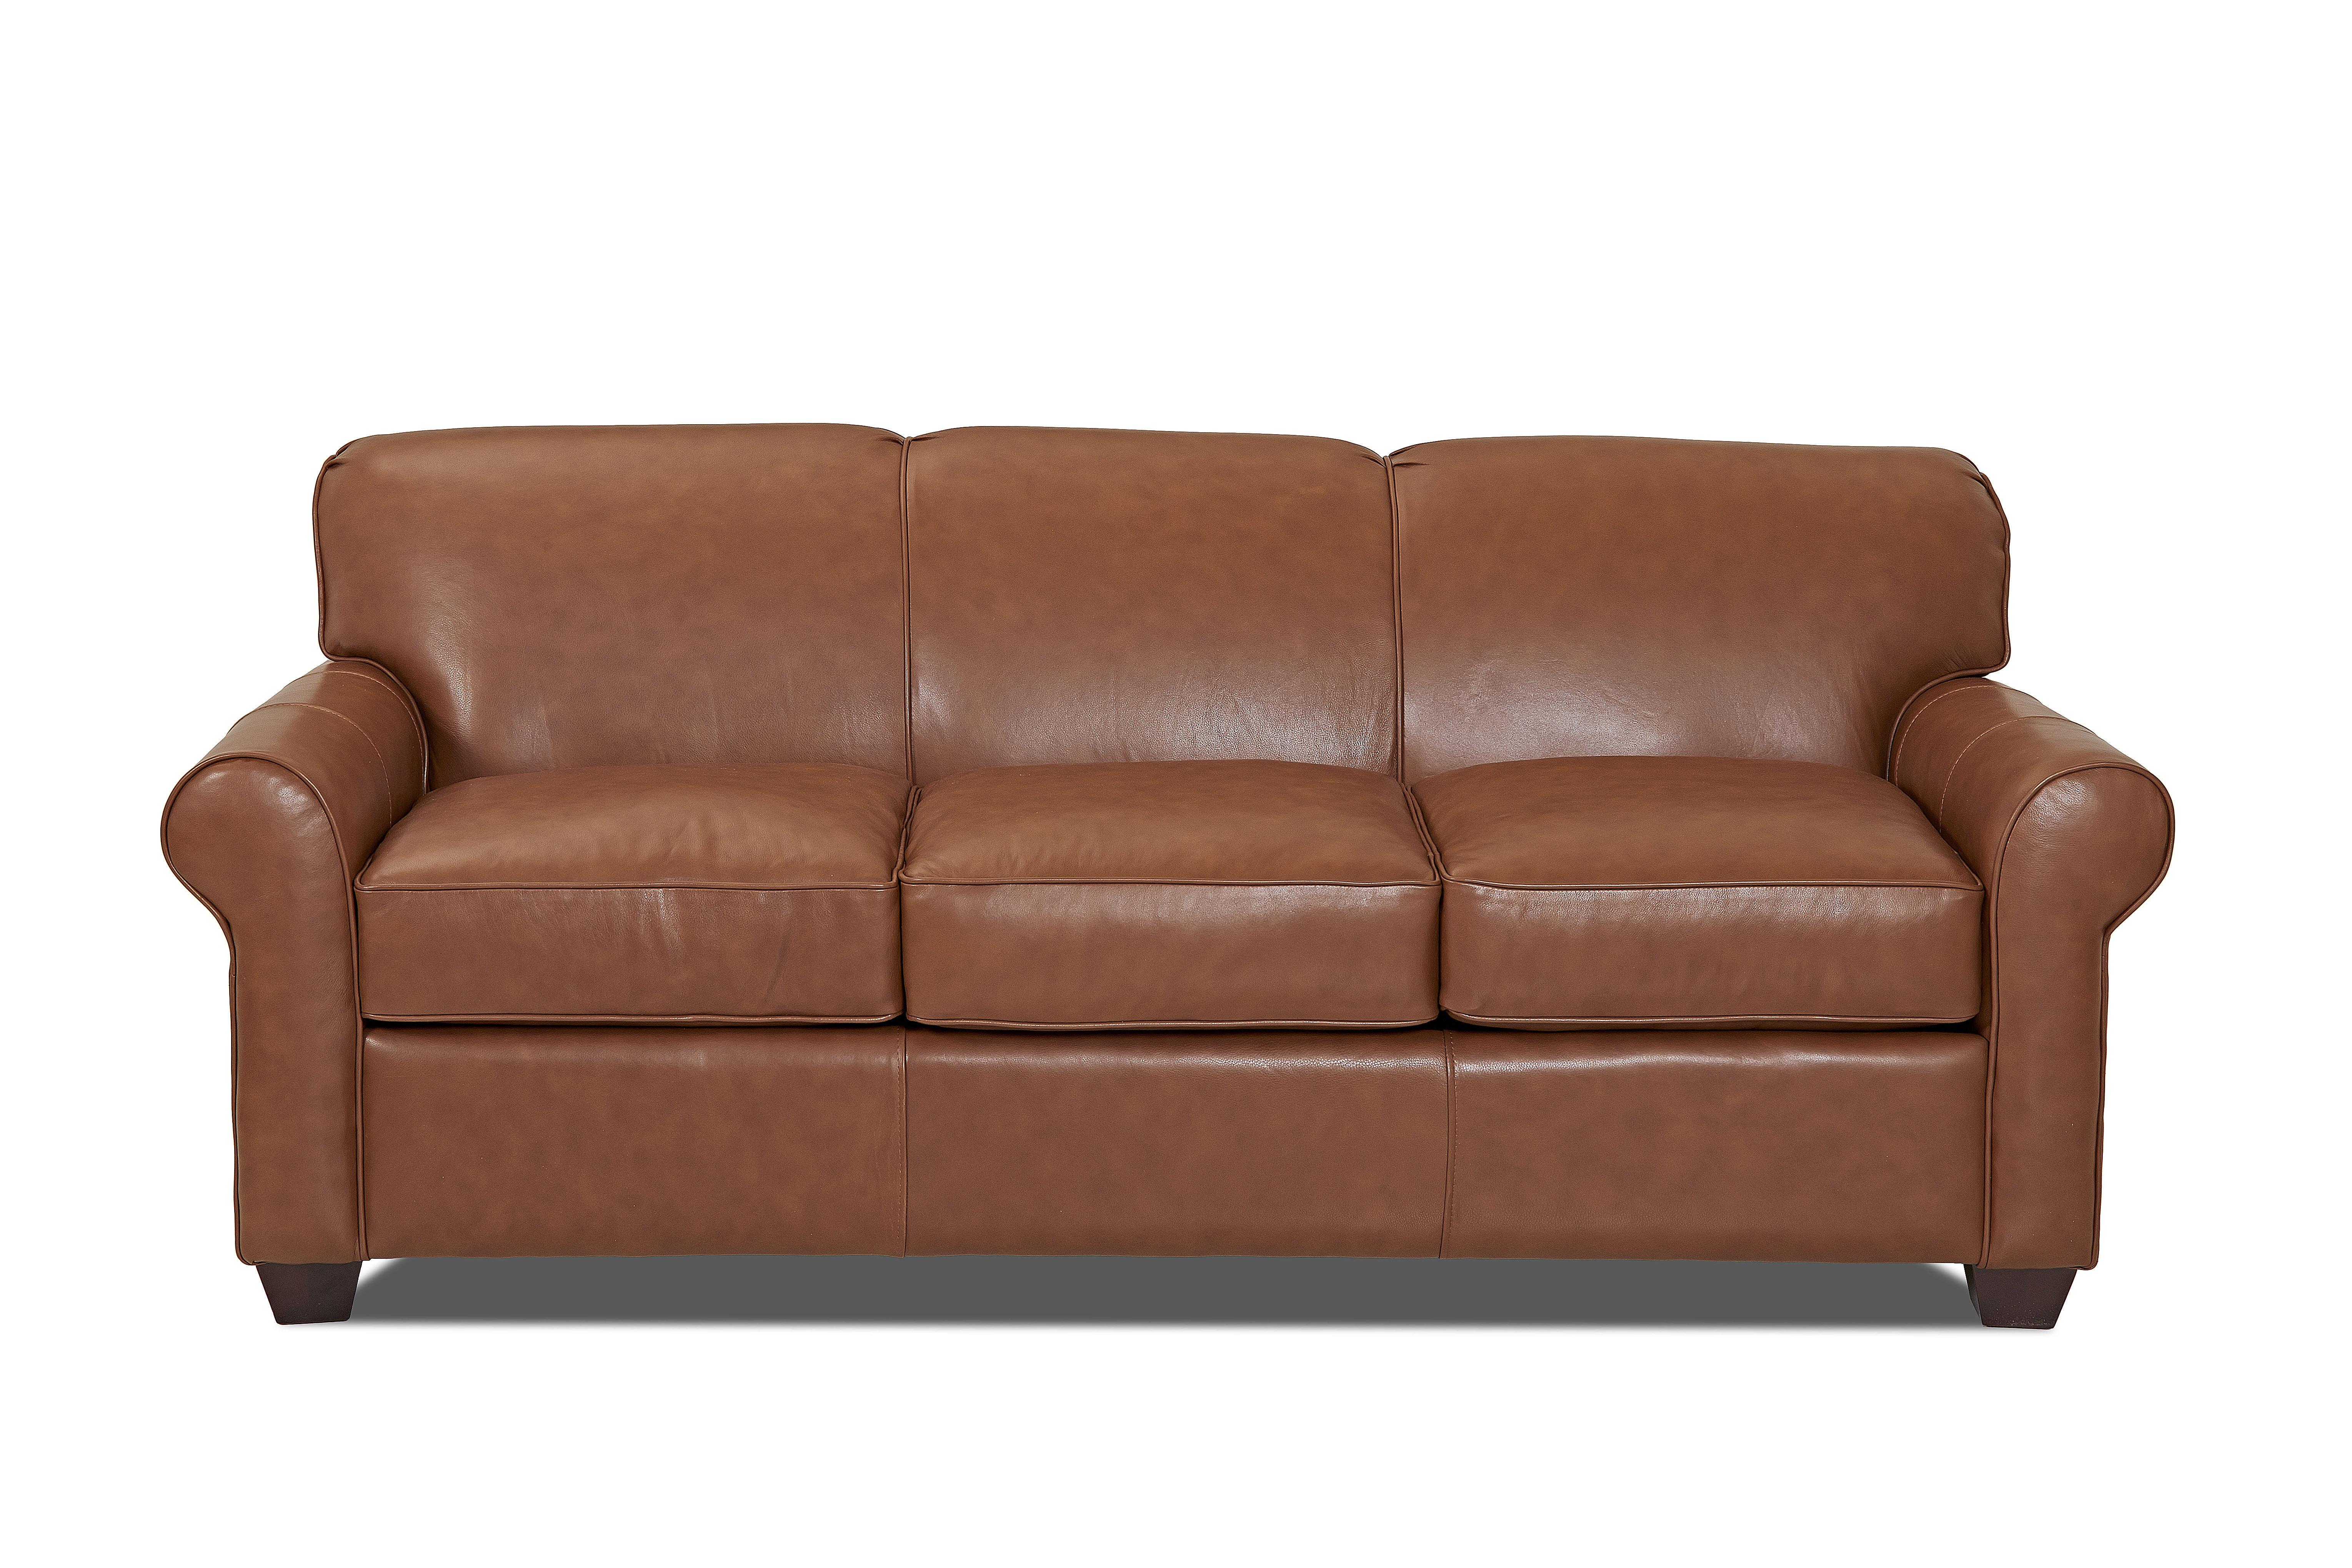 Groovy Jennifer Genuine Leather Sofa Interior Design Ideas Clesiryabchikinfo